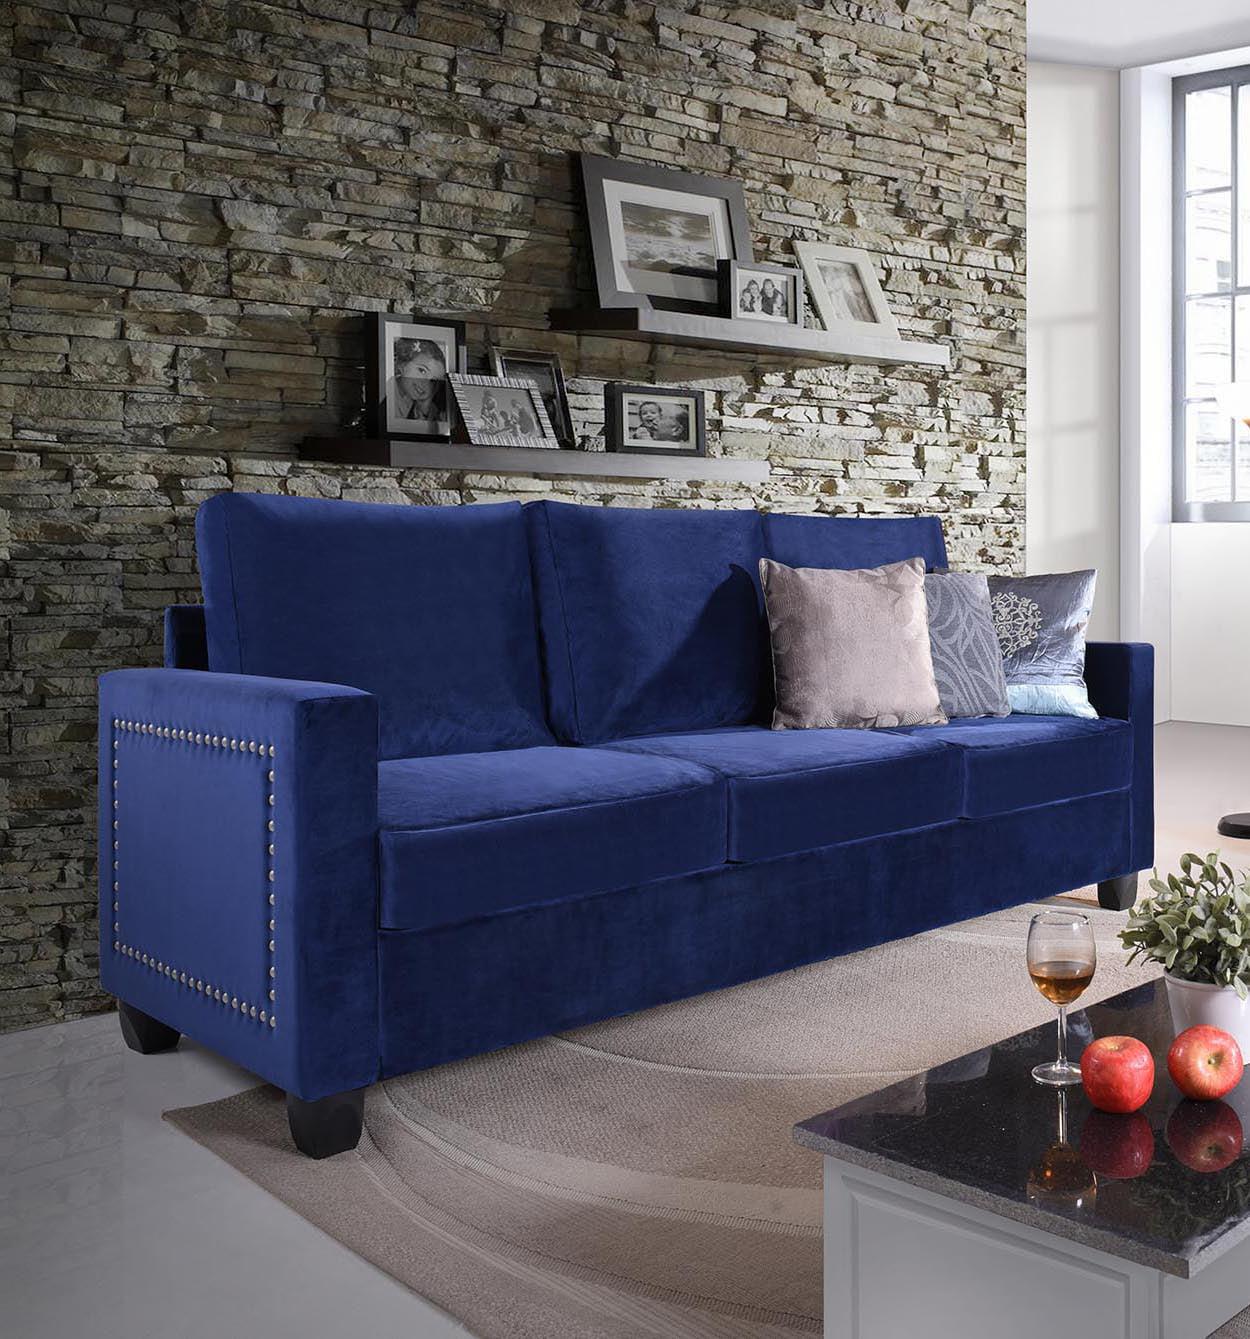 Wiles Blue Upholstered Velvet Transitional Stationary Living Room Sofa Couch (Pewter Nailheads)